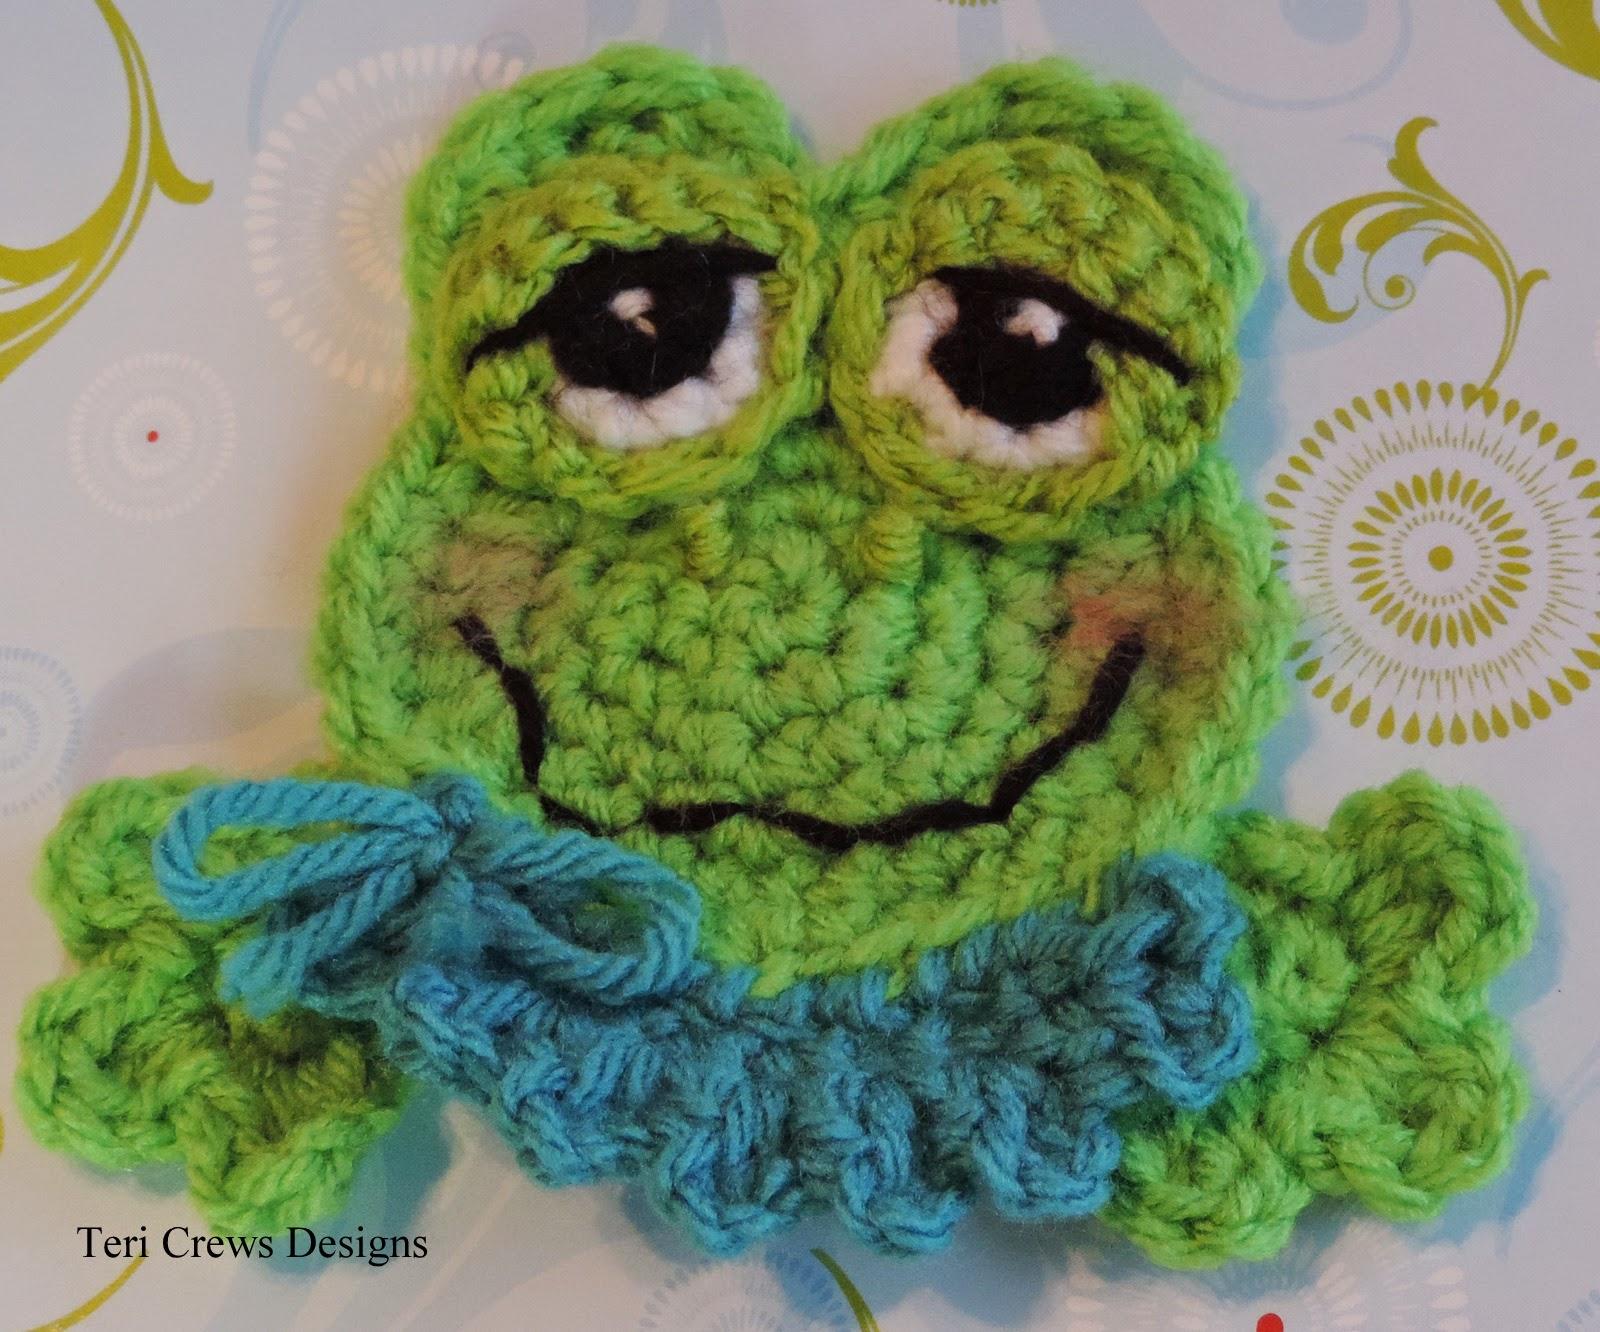 Teris blog new cute frog applique crochet pattern cute frog applique crochet pattern available bankloansurffo Gallery